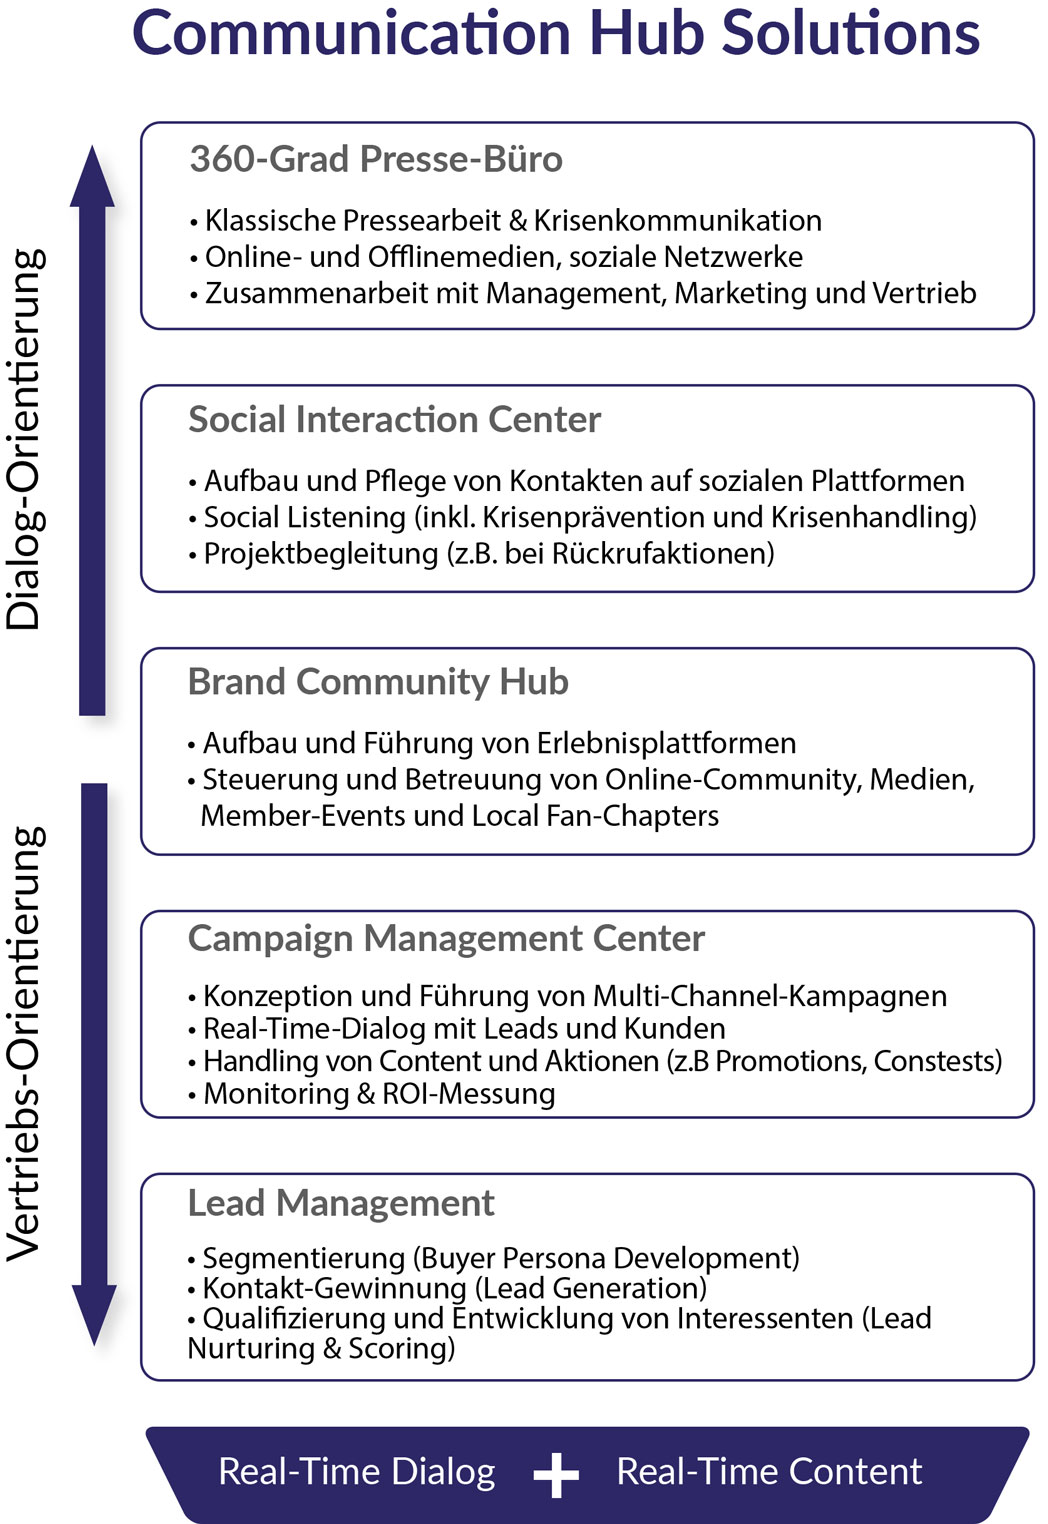 communication-hub-solutions-1